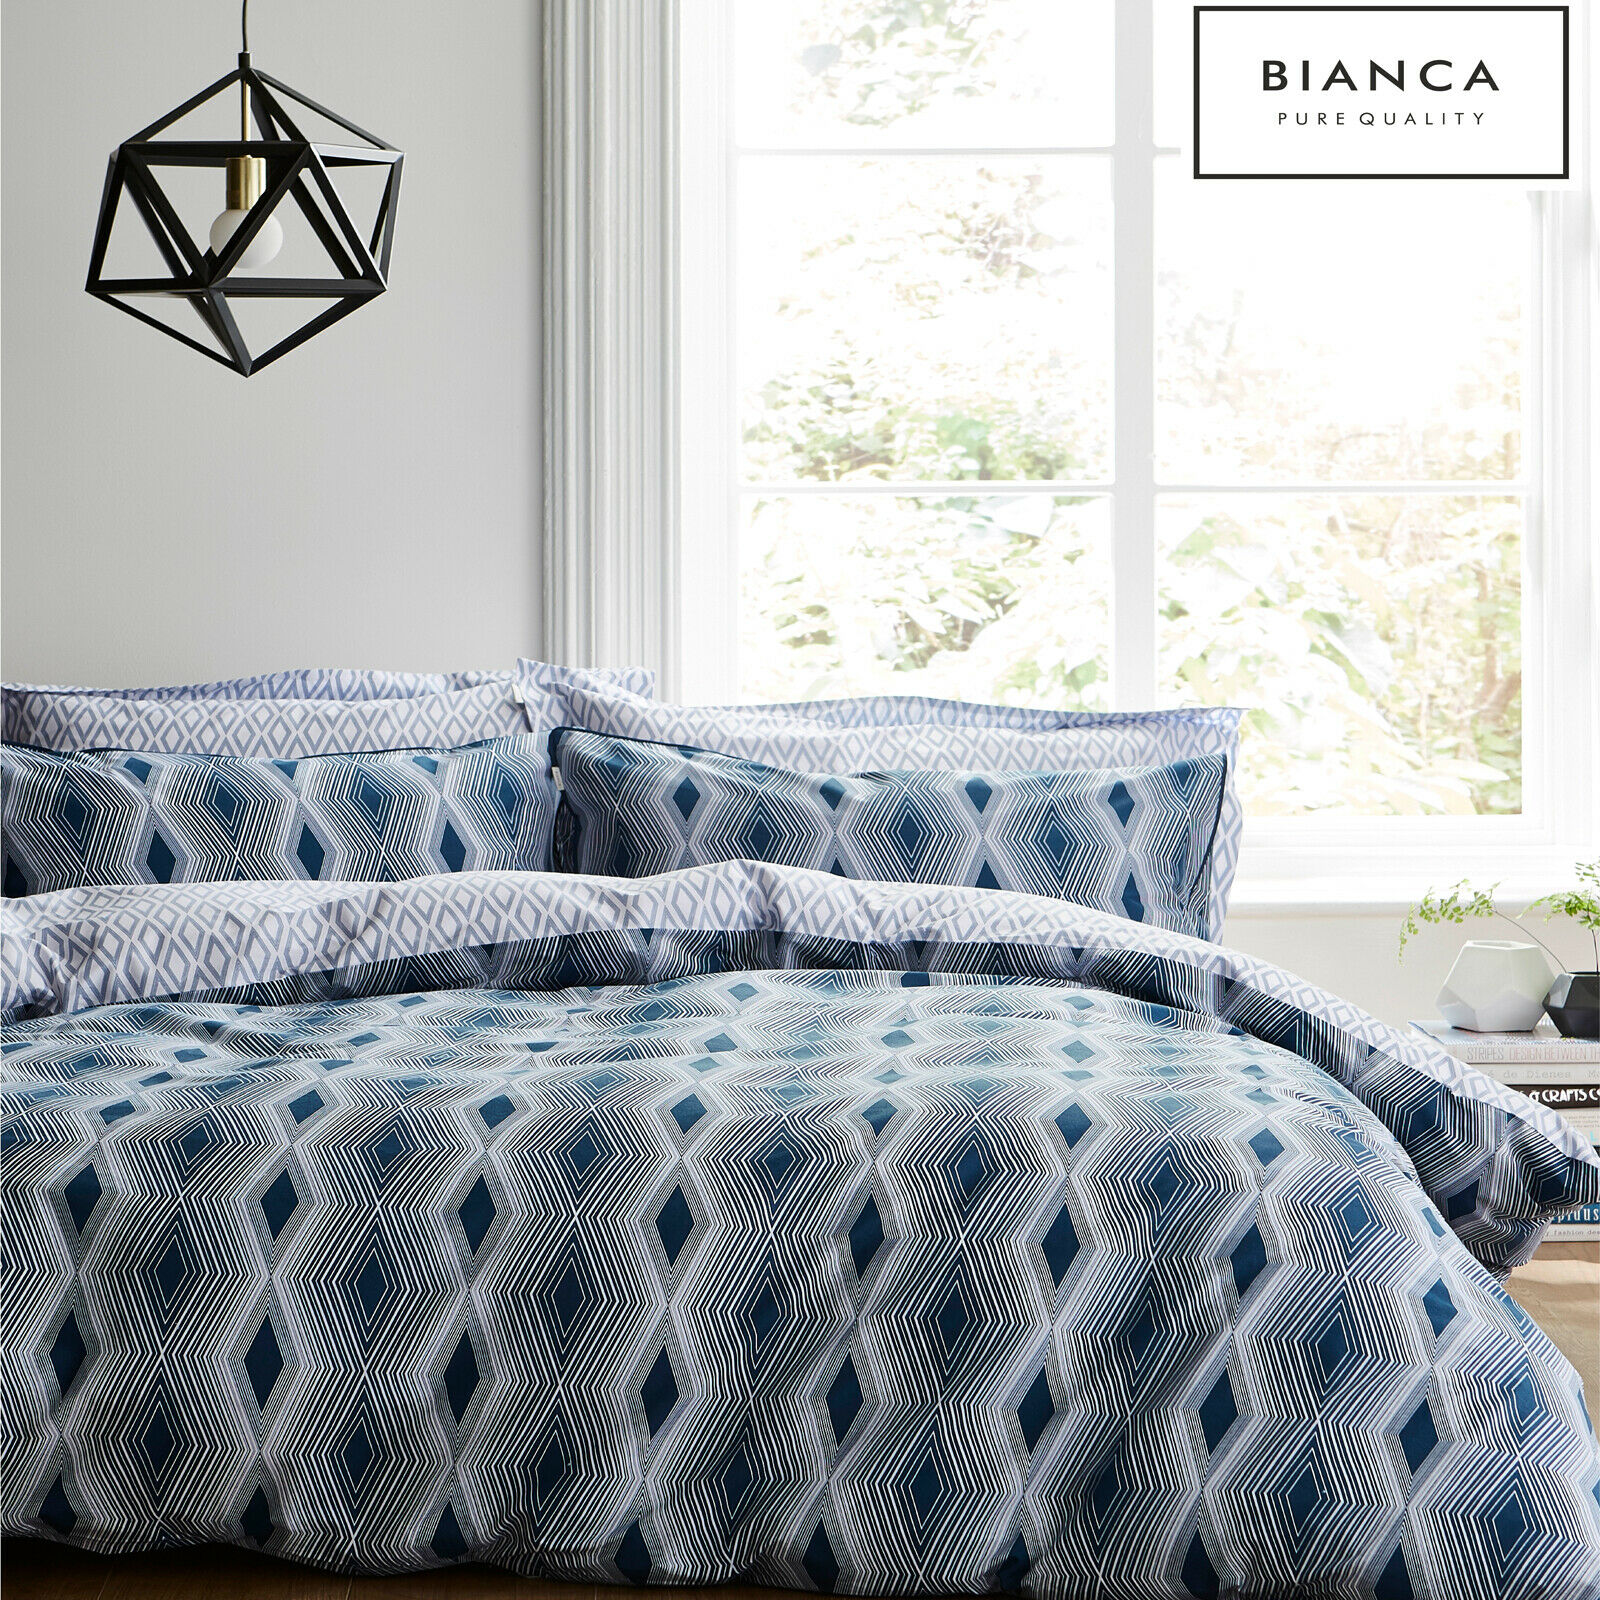 Weiß ZIGGURAT Linear Diamond Geometric 100% Cotton Soft Duvet Cover Set Blau